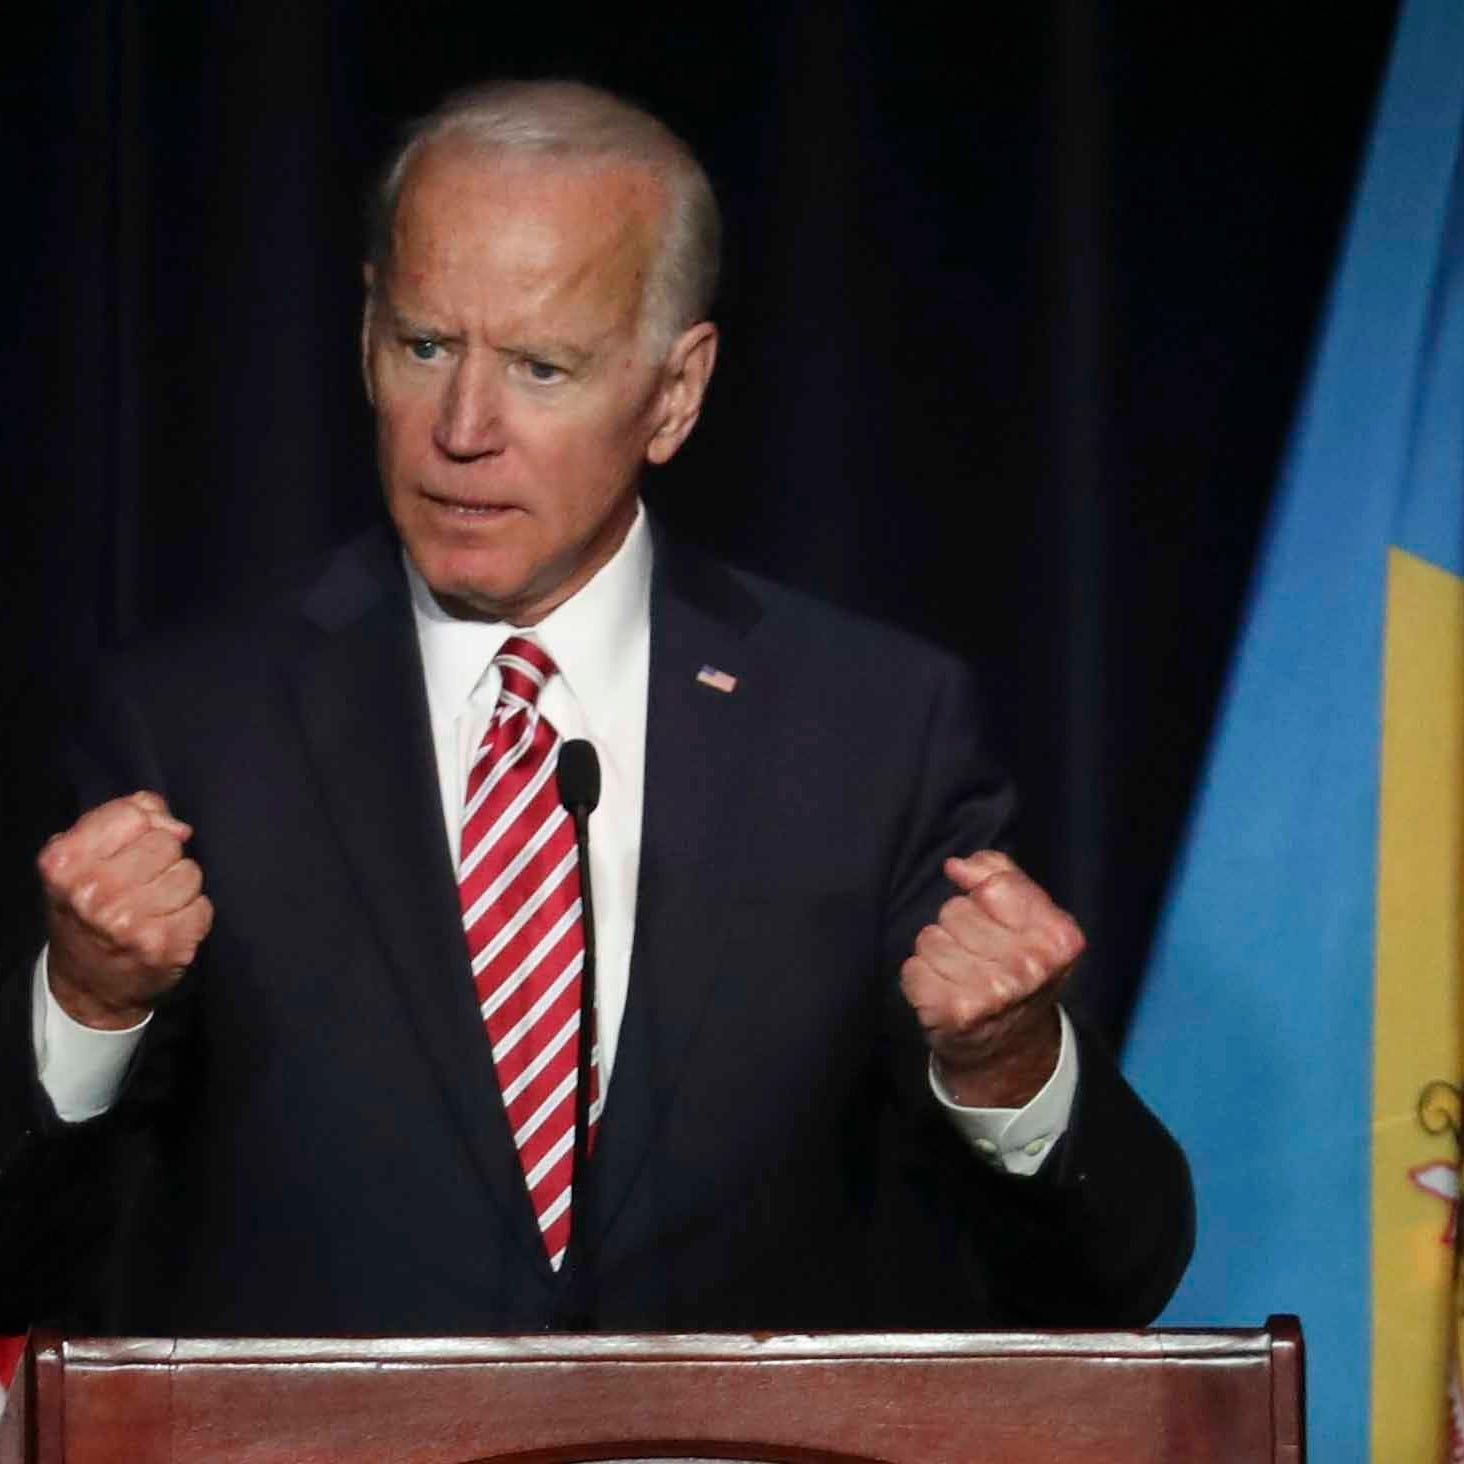 Joe Biden almost announces presidential candidacy, says he has 'most progressive record'